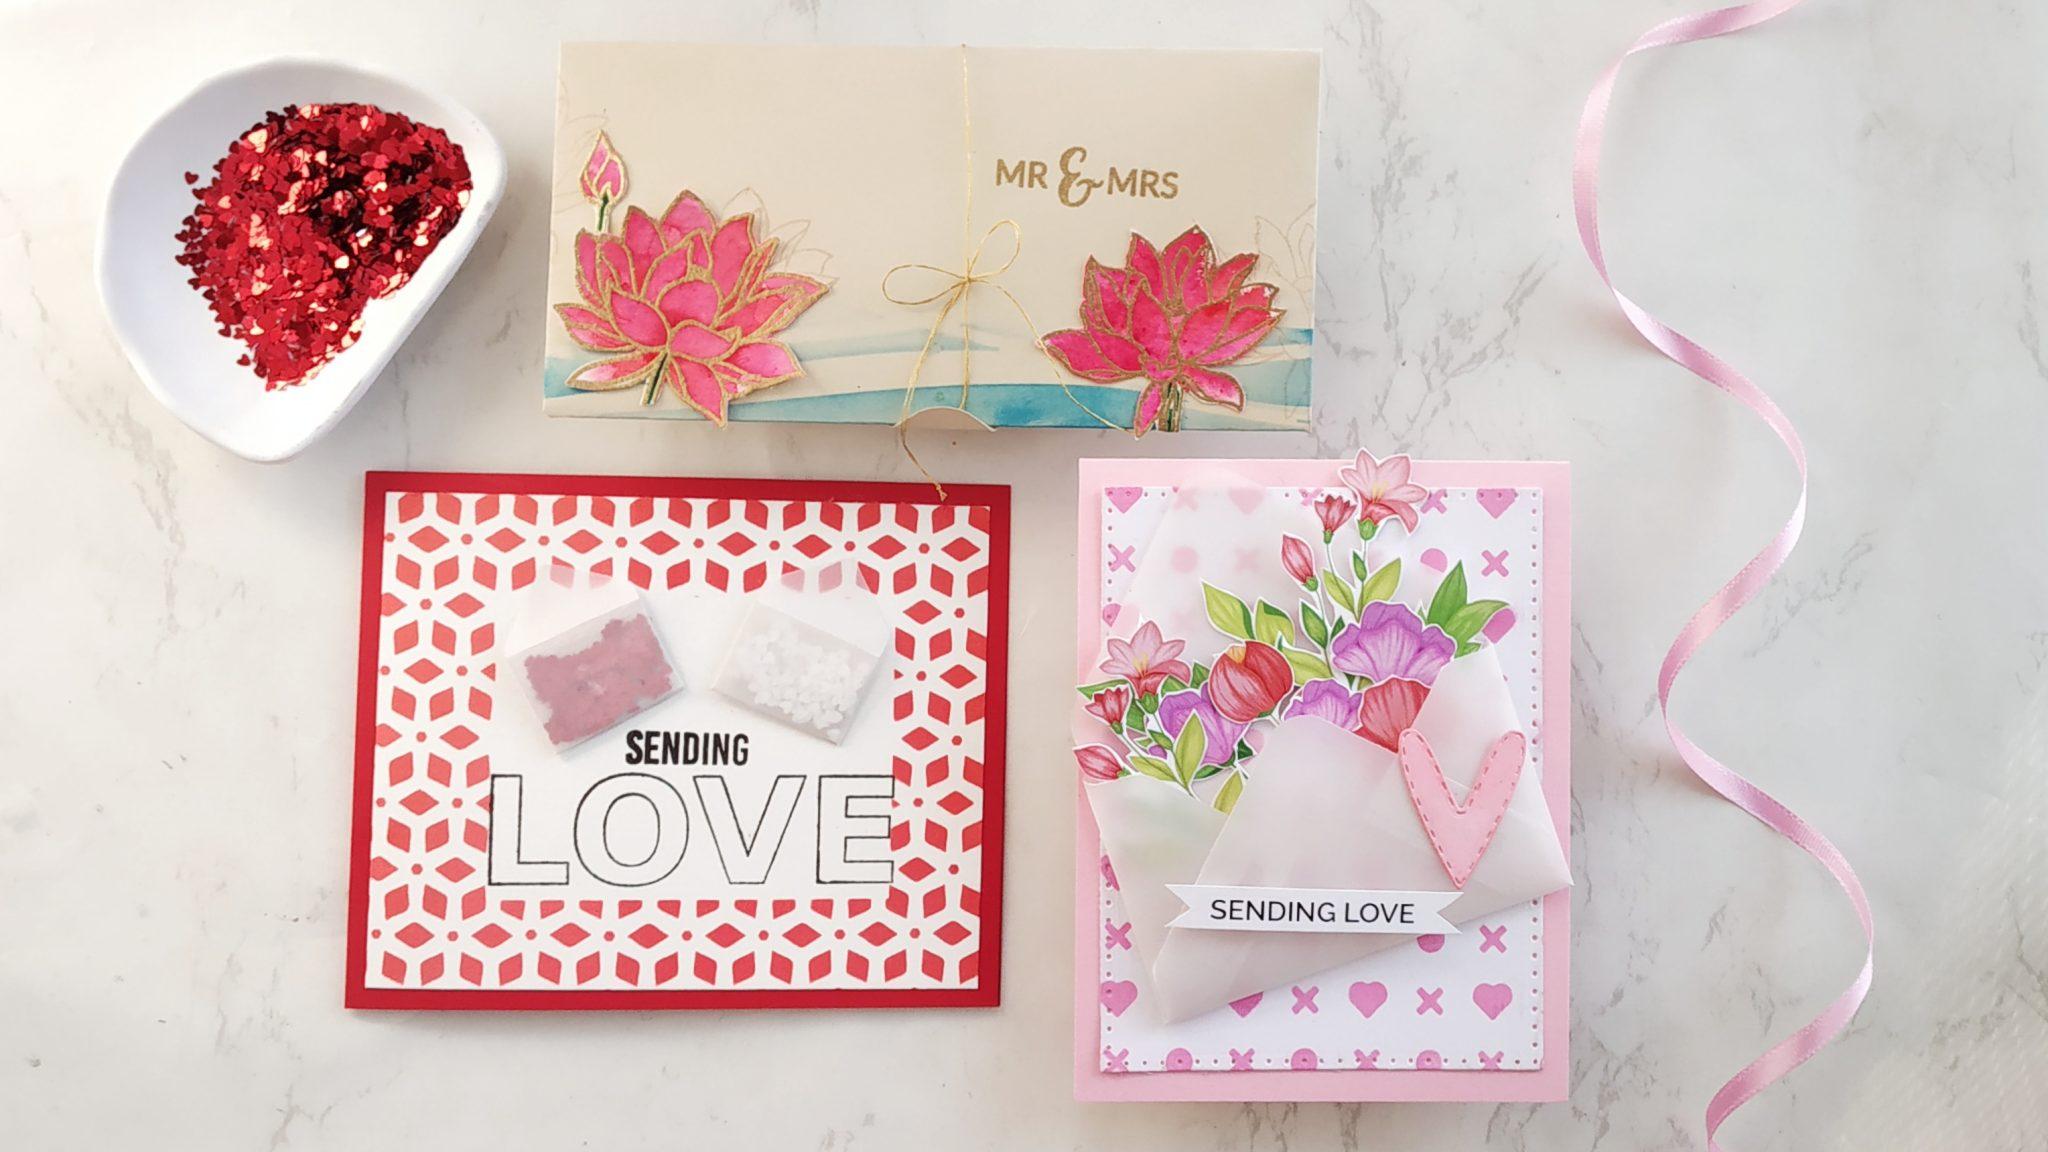 DIY envelopes - Send love in unique envelopes Video tutorial 1